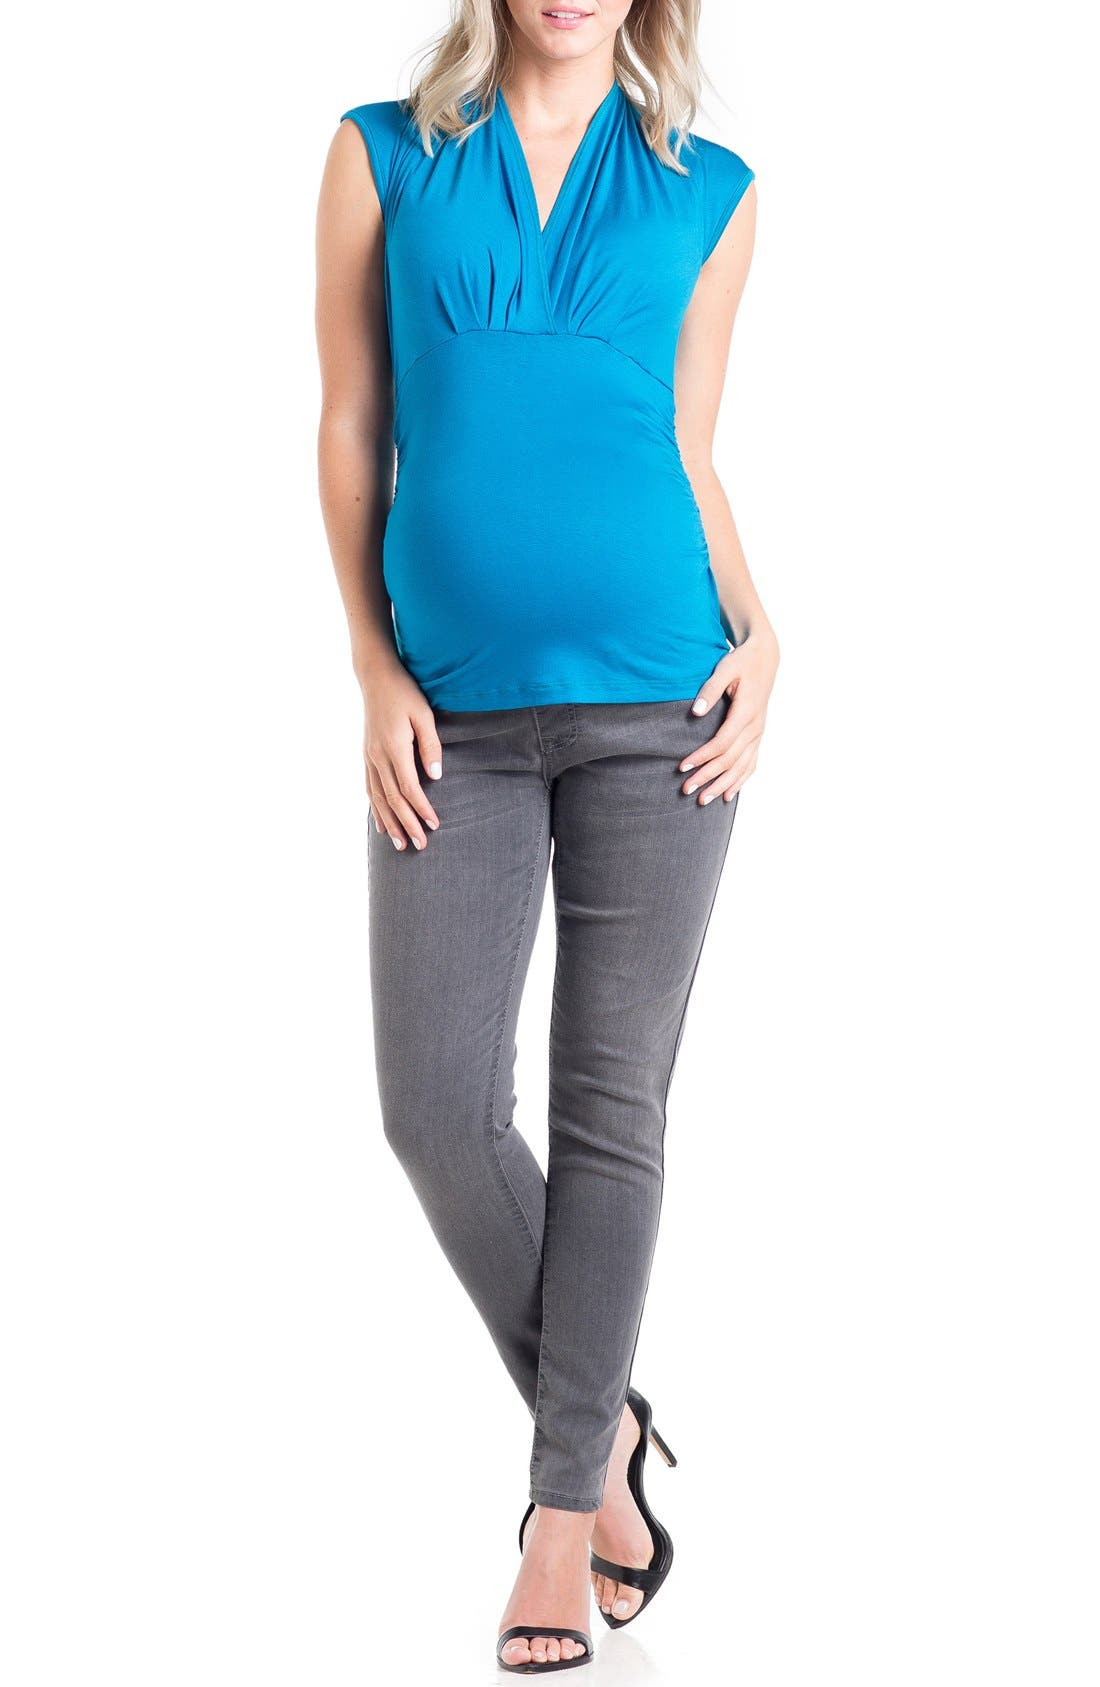 Main Image - Lilac Clothing 'Megan' V-Neck Maternity Top